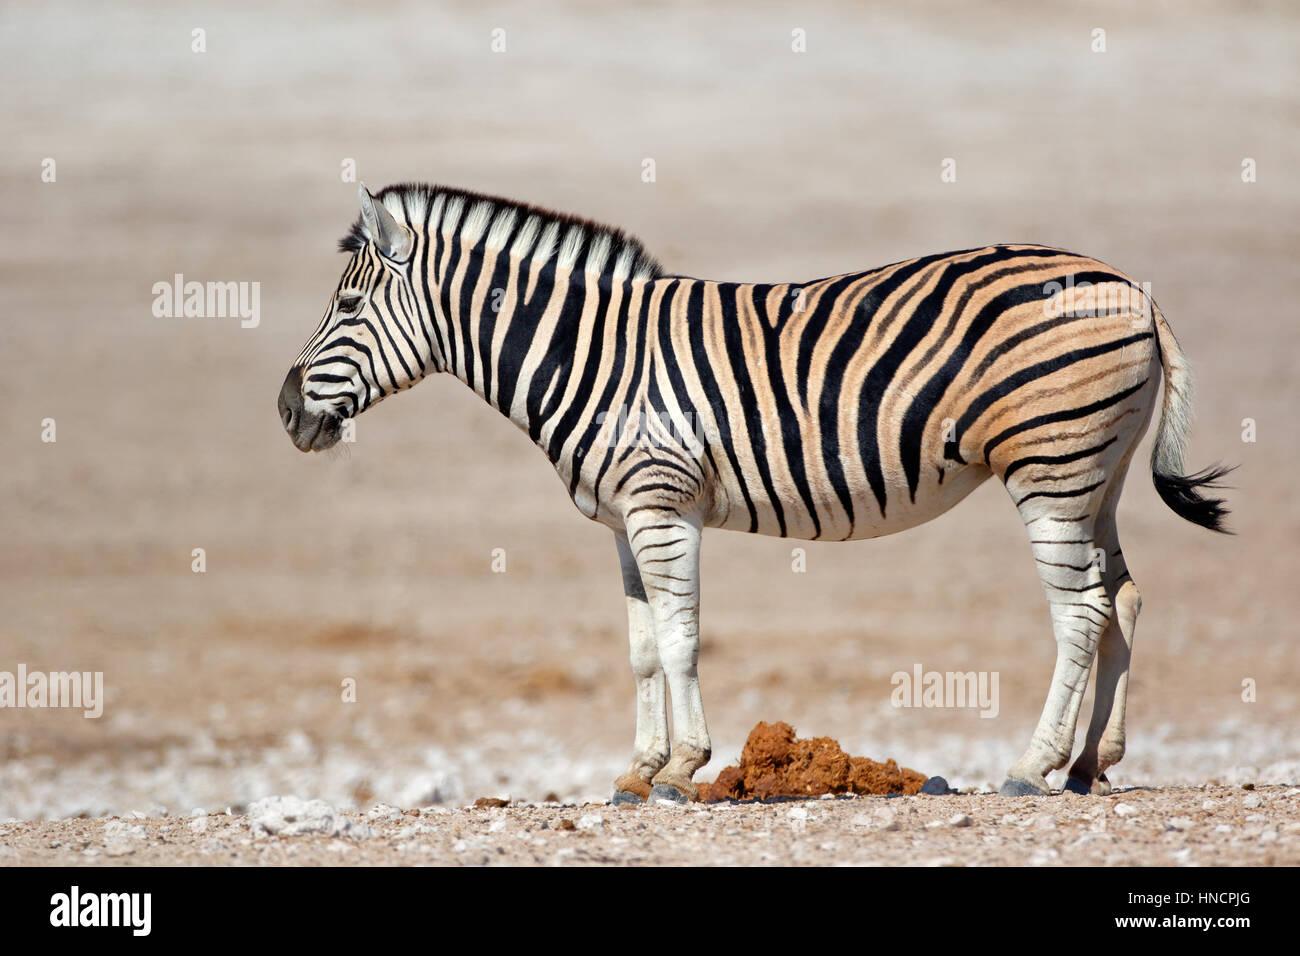 Una pianura (Burchells) zebra (Equus burchelli), il Parco Nazionale di Etosha, Namibia Immagini Stock